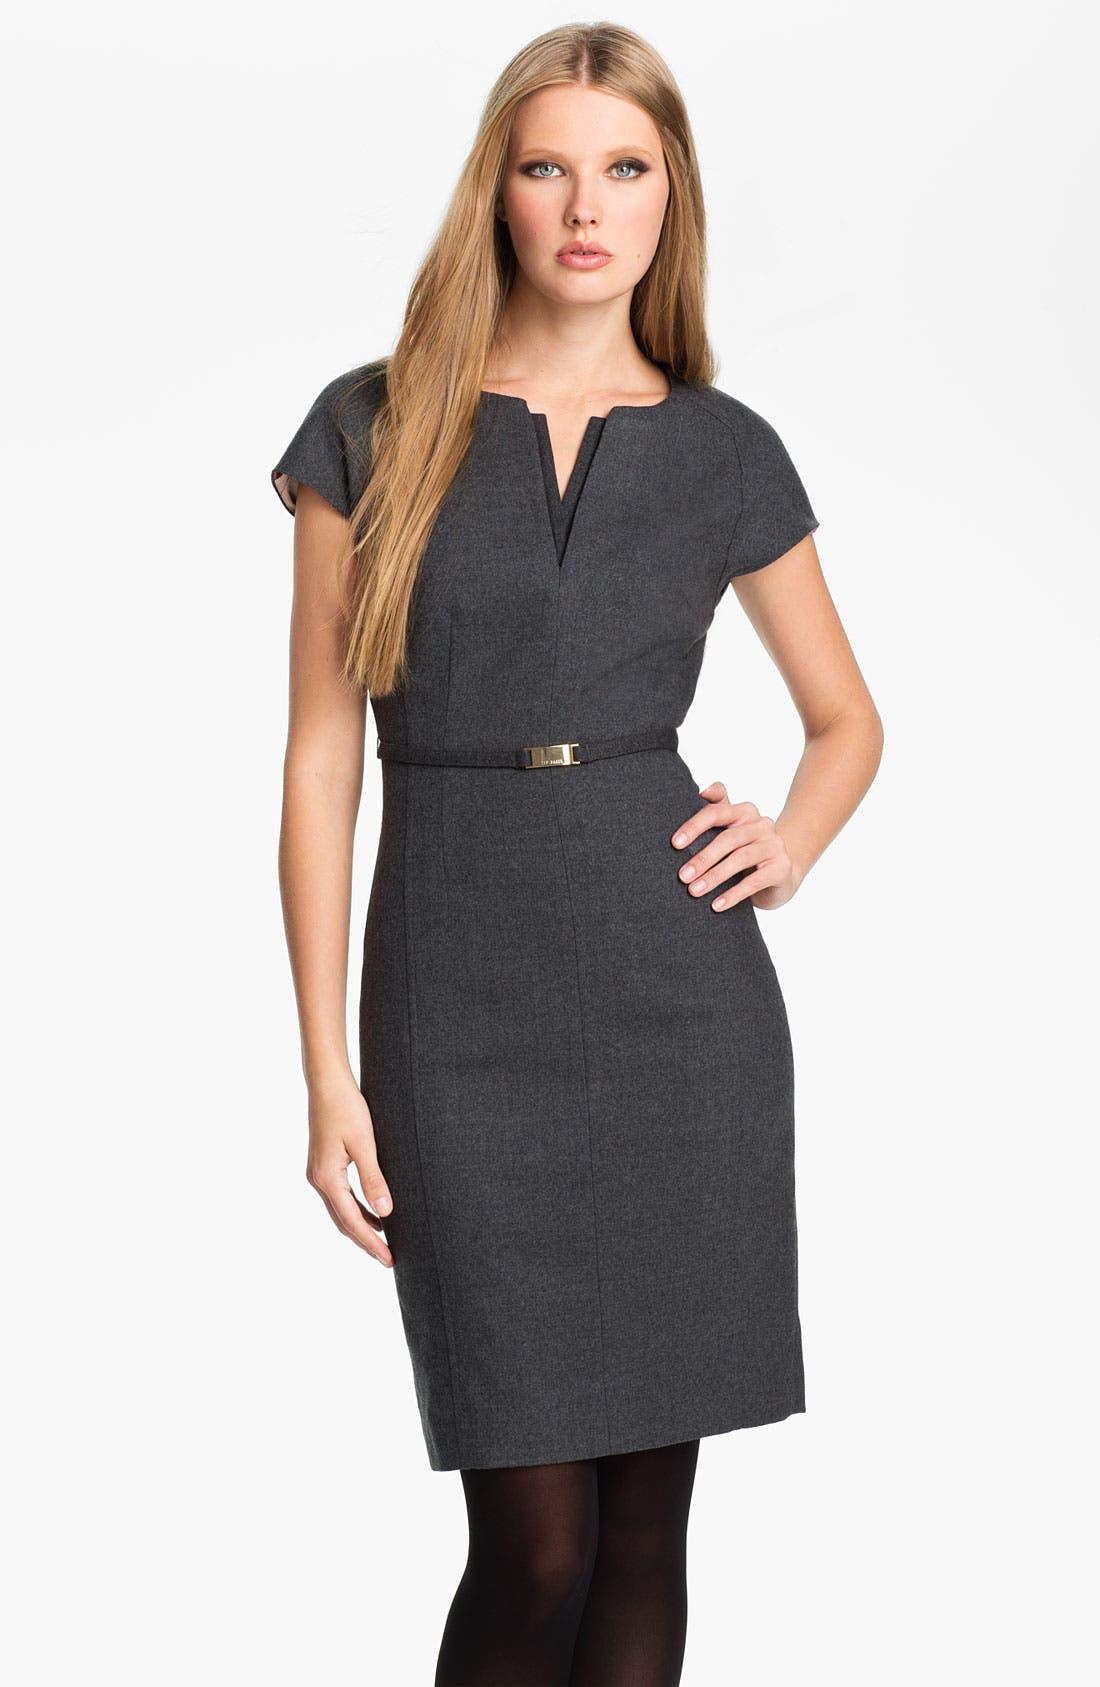 Alternate Image 1 Selected - Ted Baker London 'Neyoad' Wool Sheath Dress